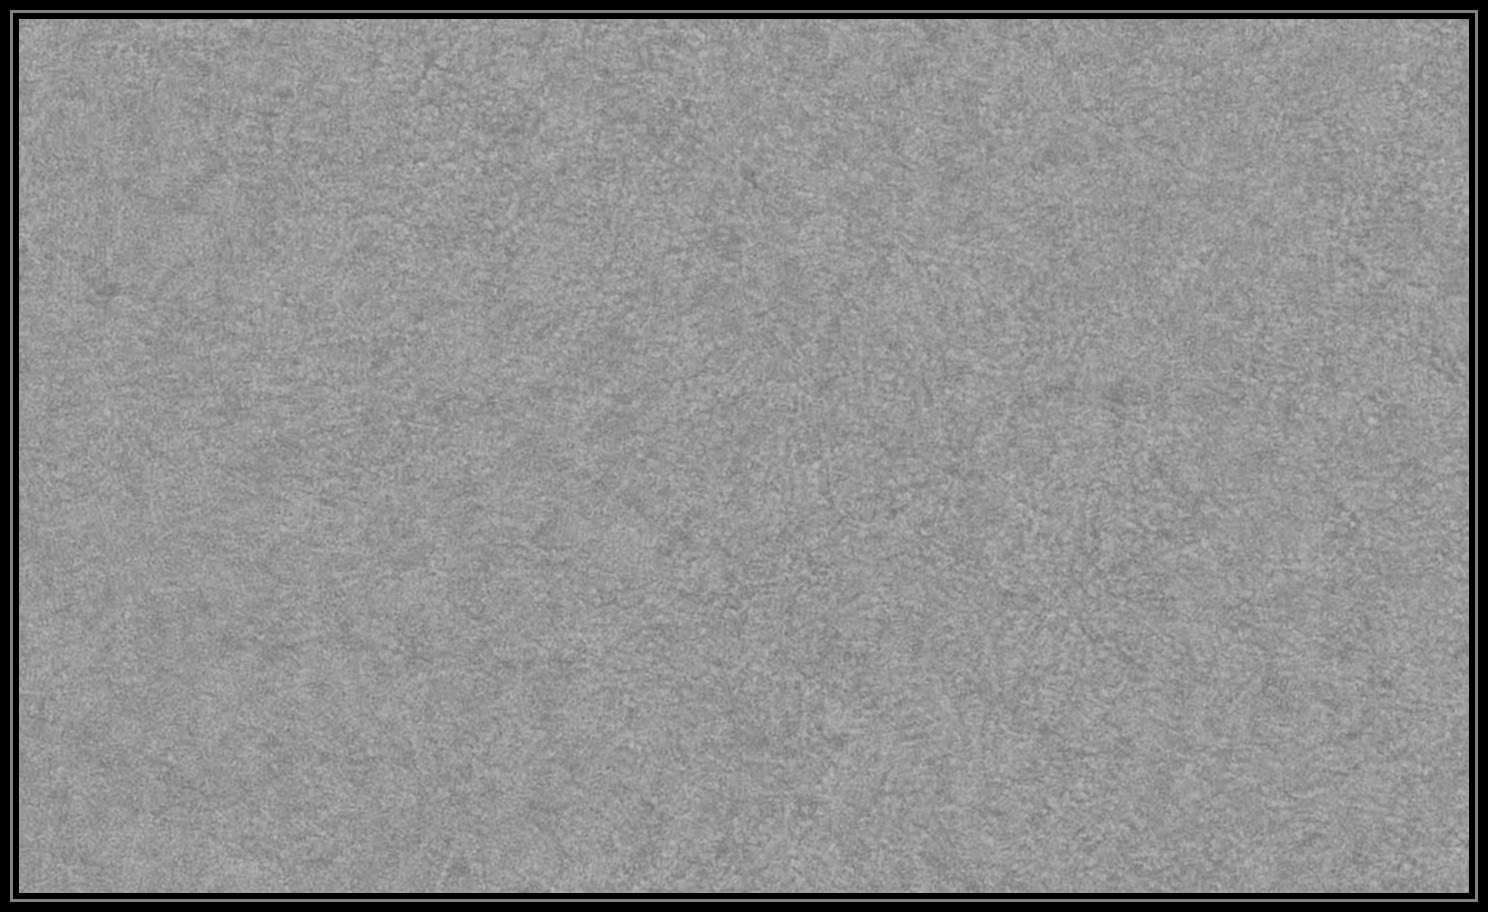 5ed674f227b55_Sun_162811_310520_ZWOASI290MM_Continuum_AS_P10_lapl5_ap360.jpg.cfe48f6301aeb964fd7160af8158c773.jpg